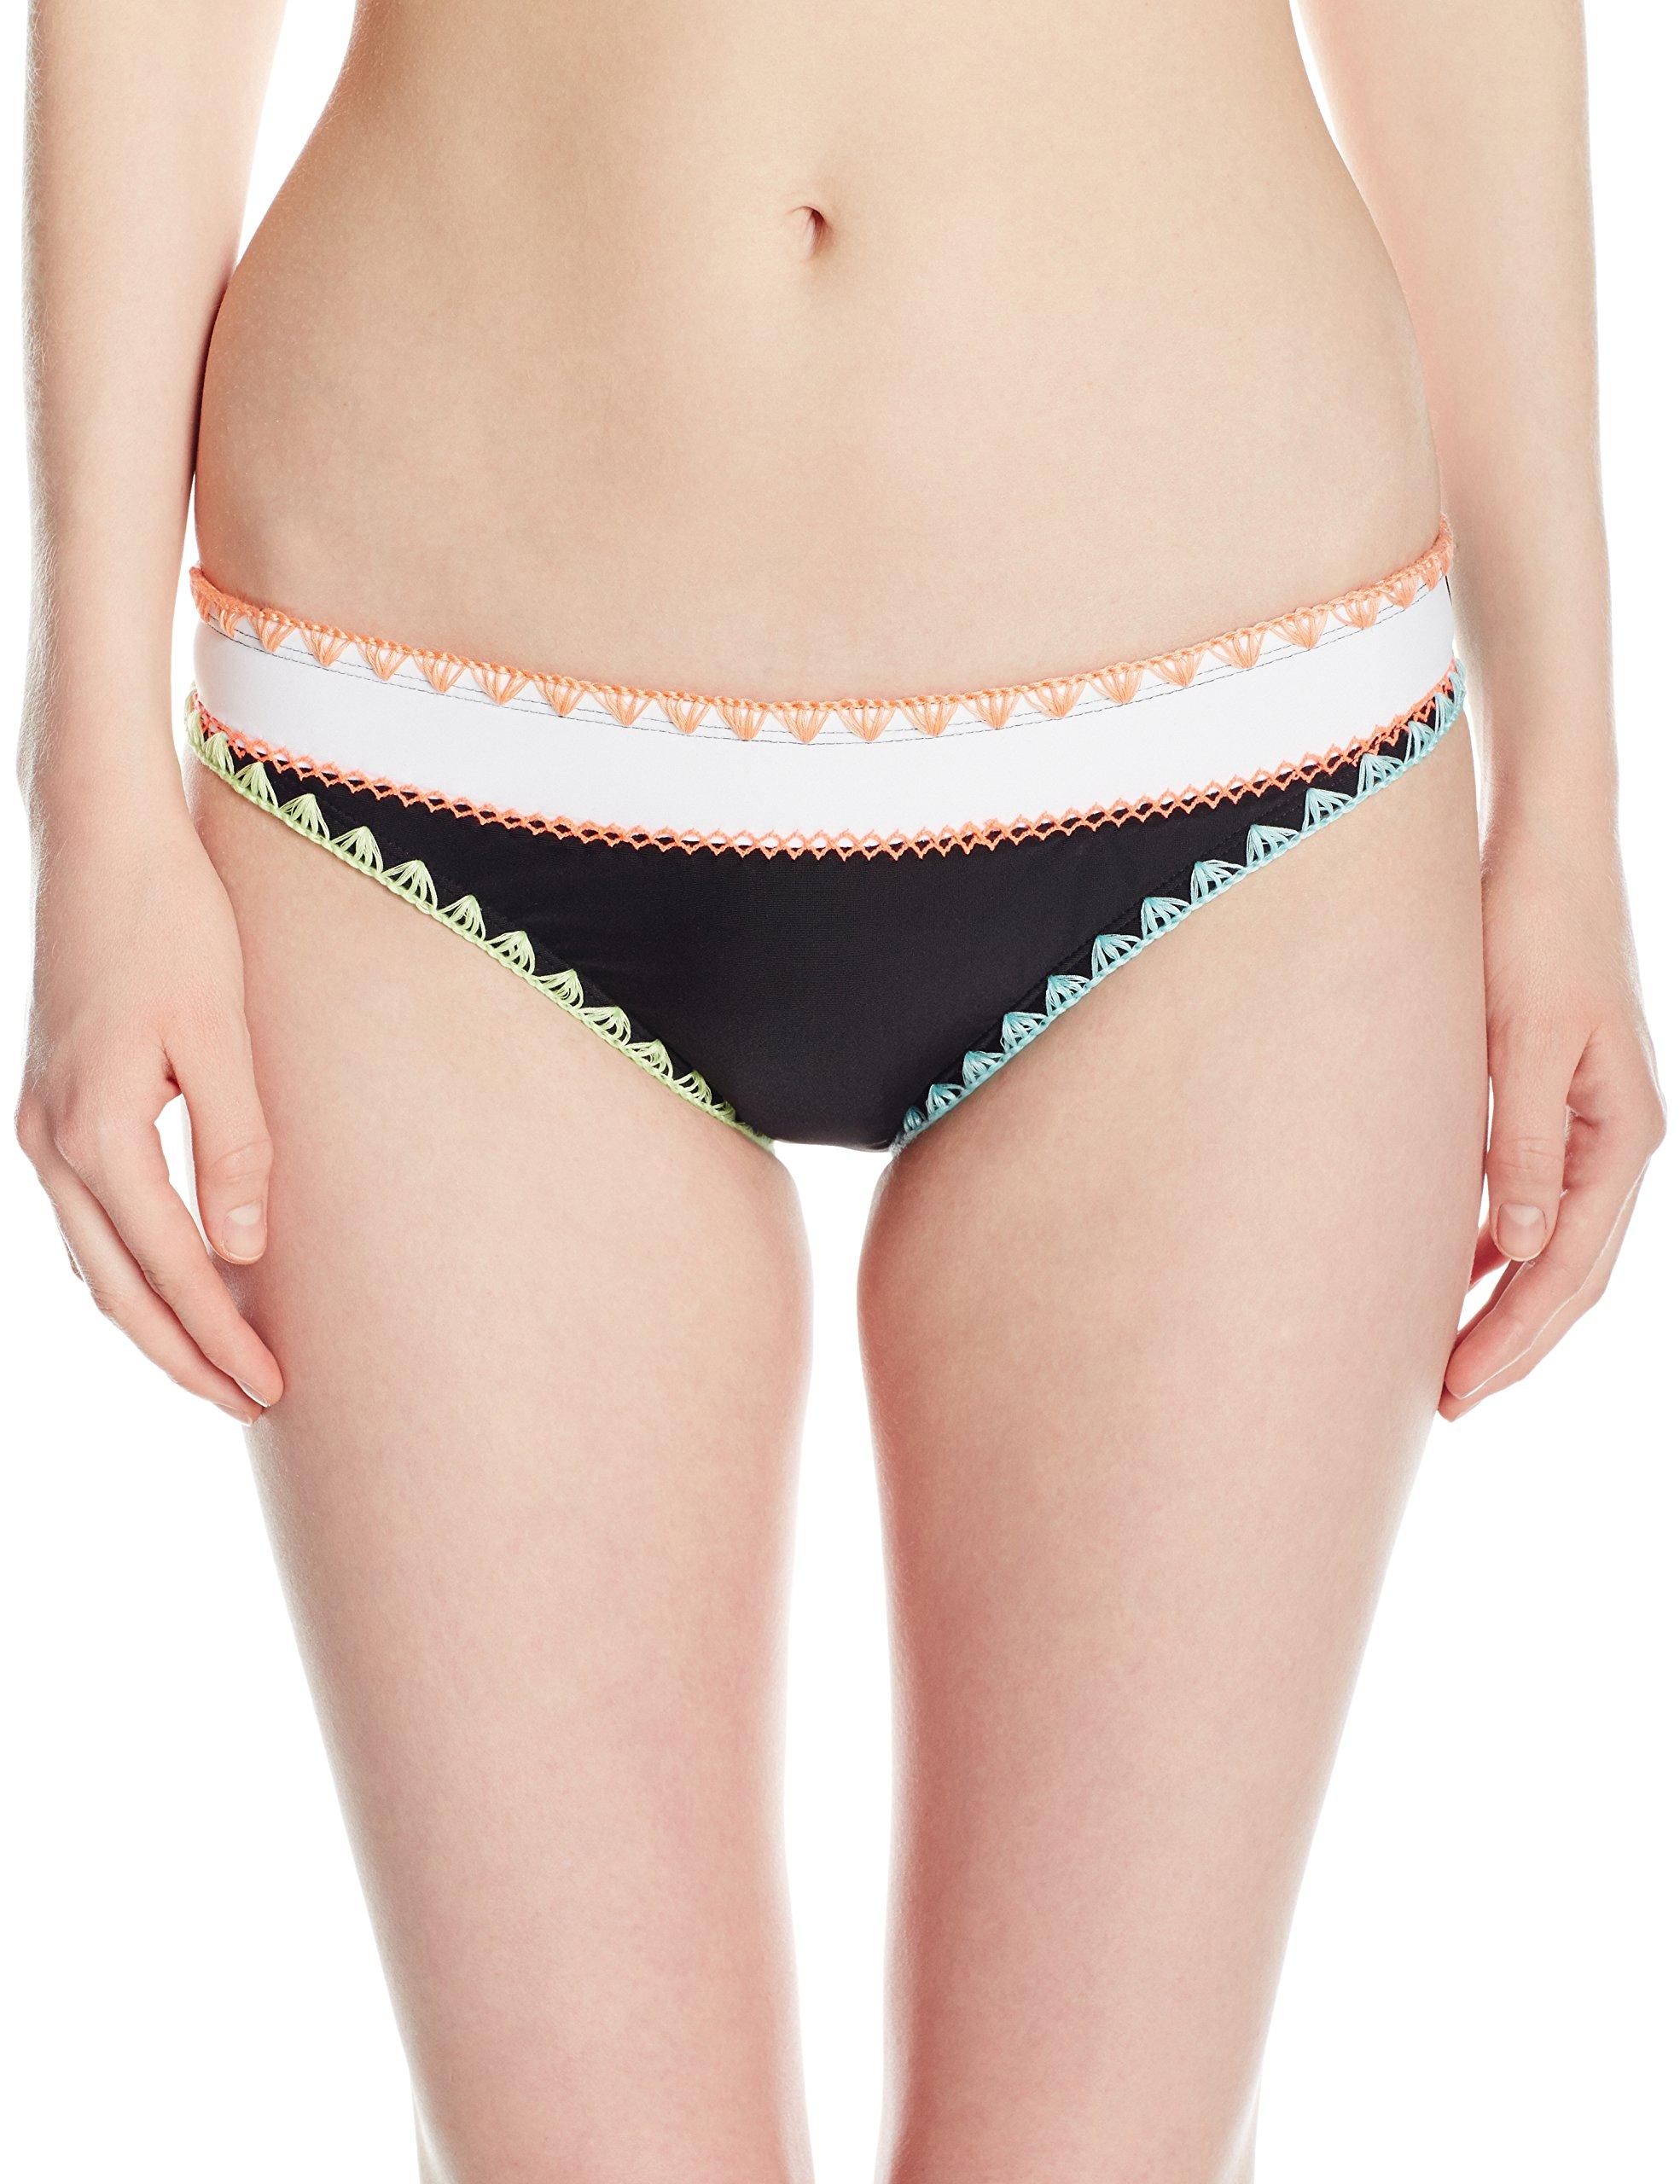 Hobie Junior's Keep The Piece Whip Stitch Hipster Bikini Bottom, Black/White, M